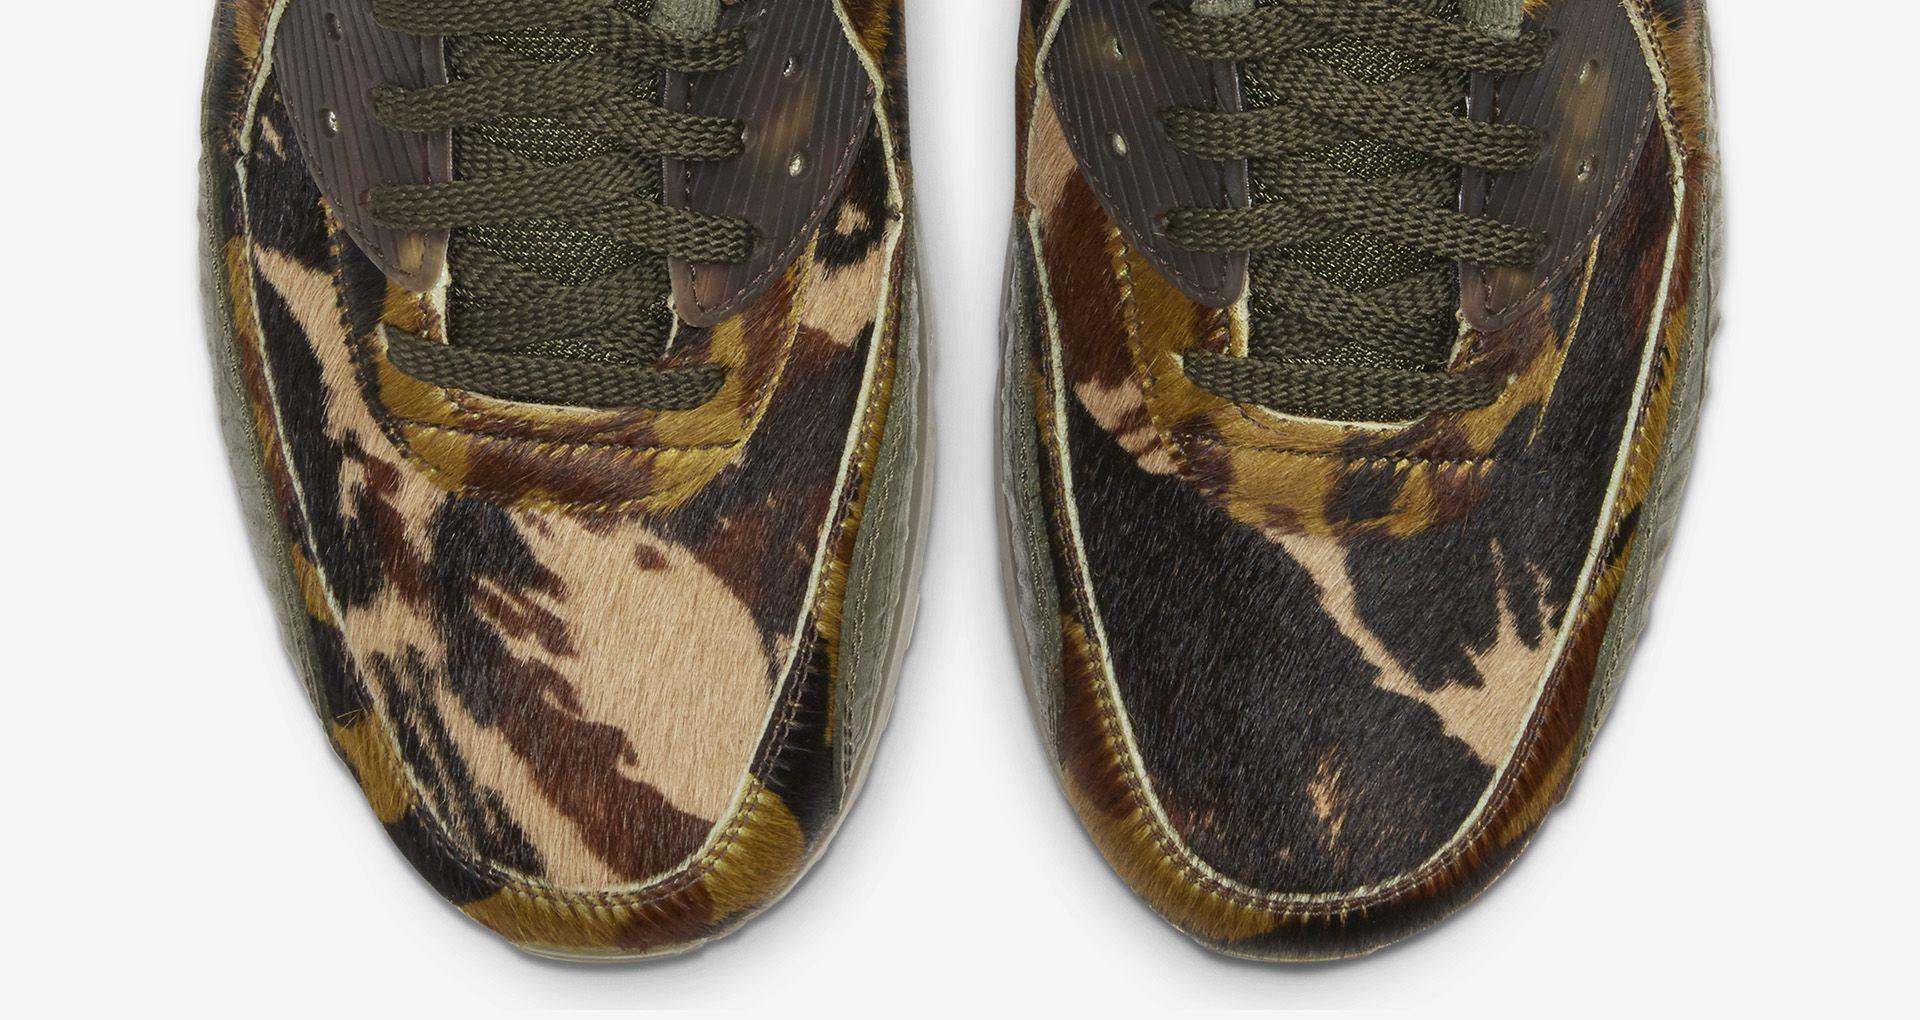 Air Max 90 2 'Gator Green' Release Date. Nike SNEAKRS SA